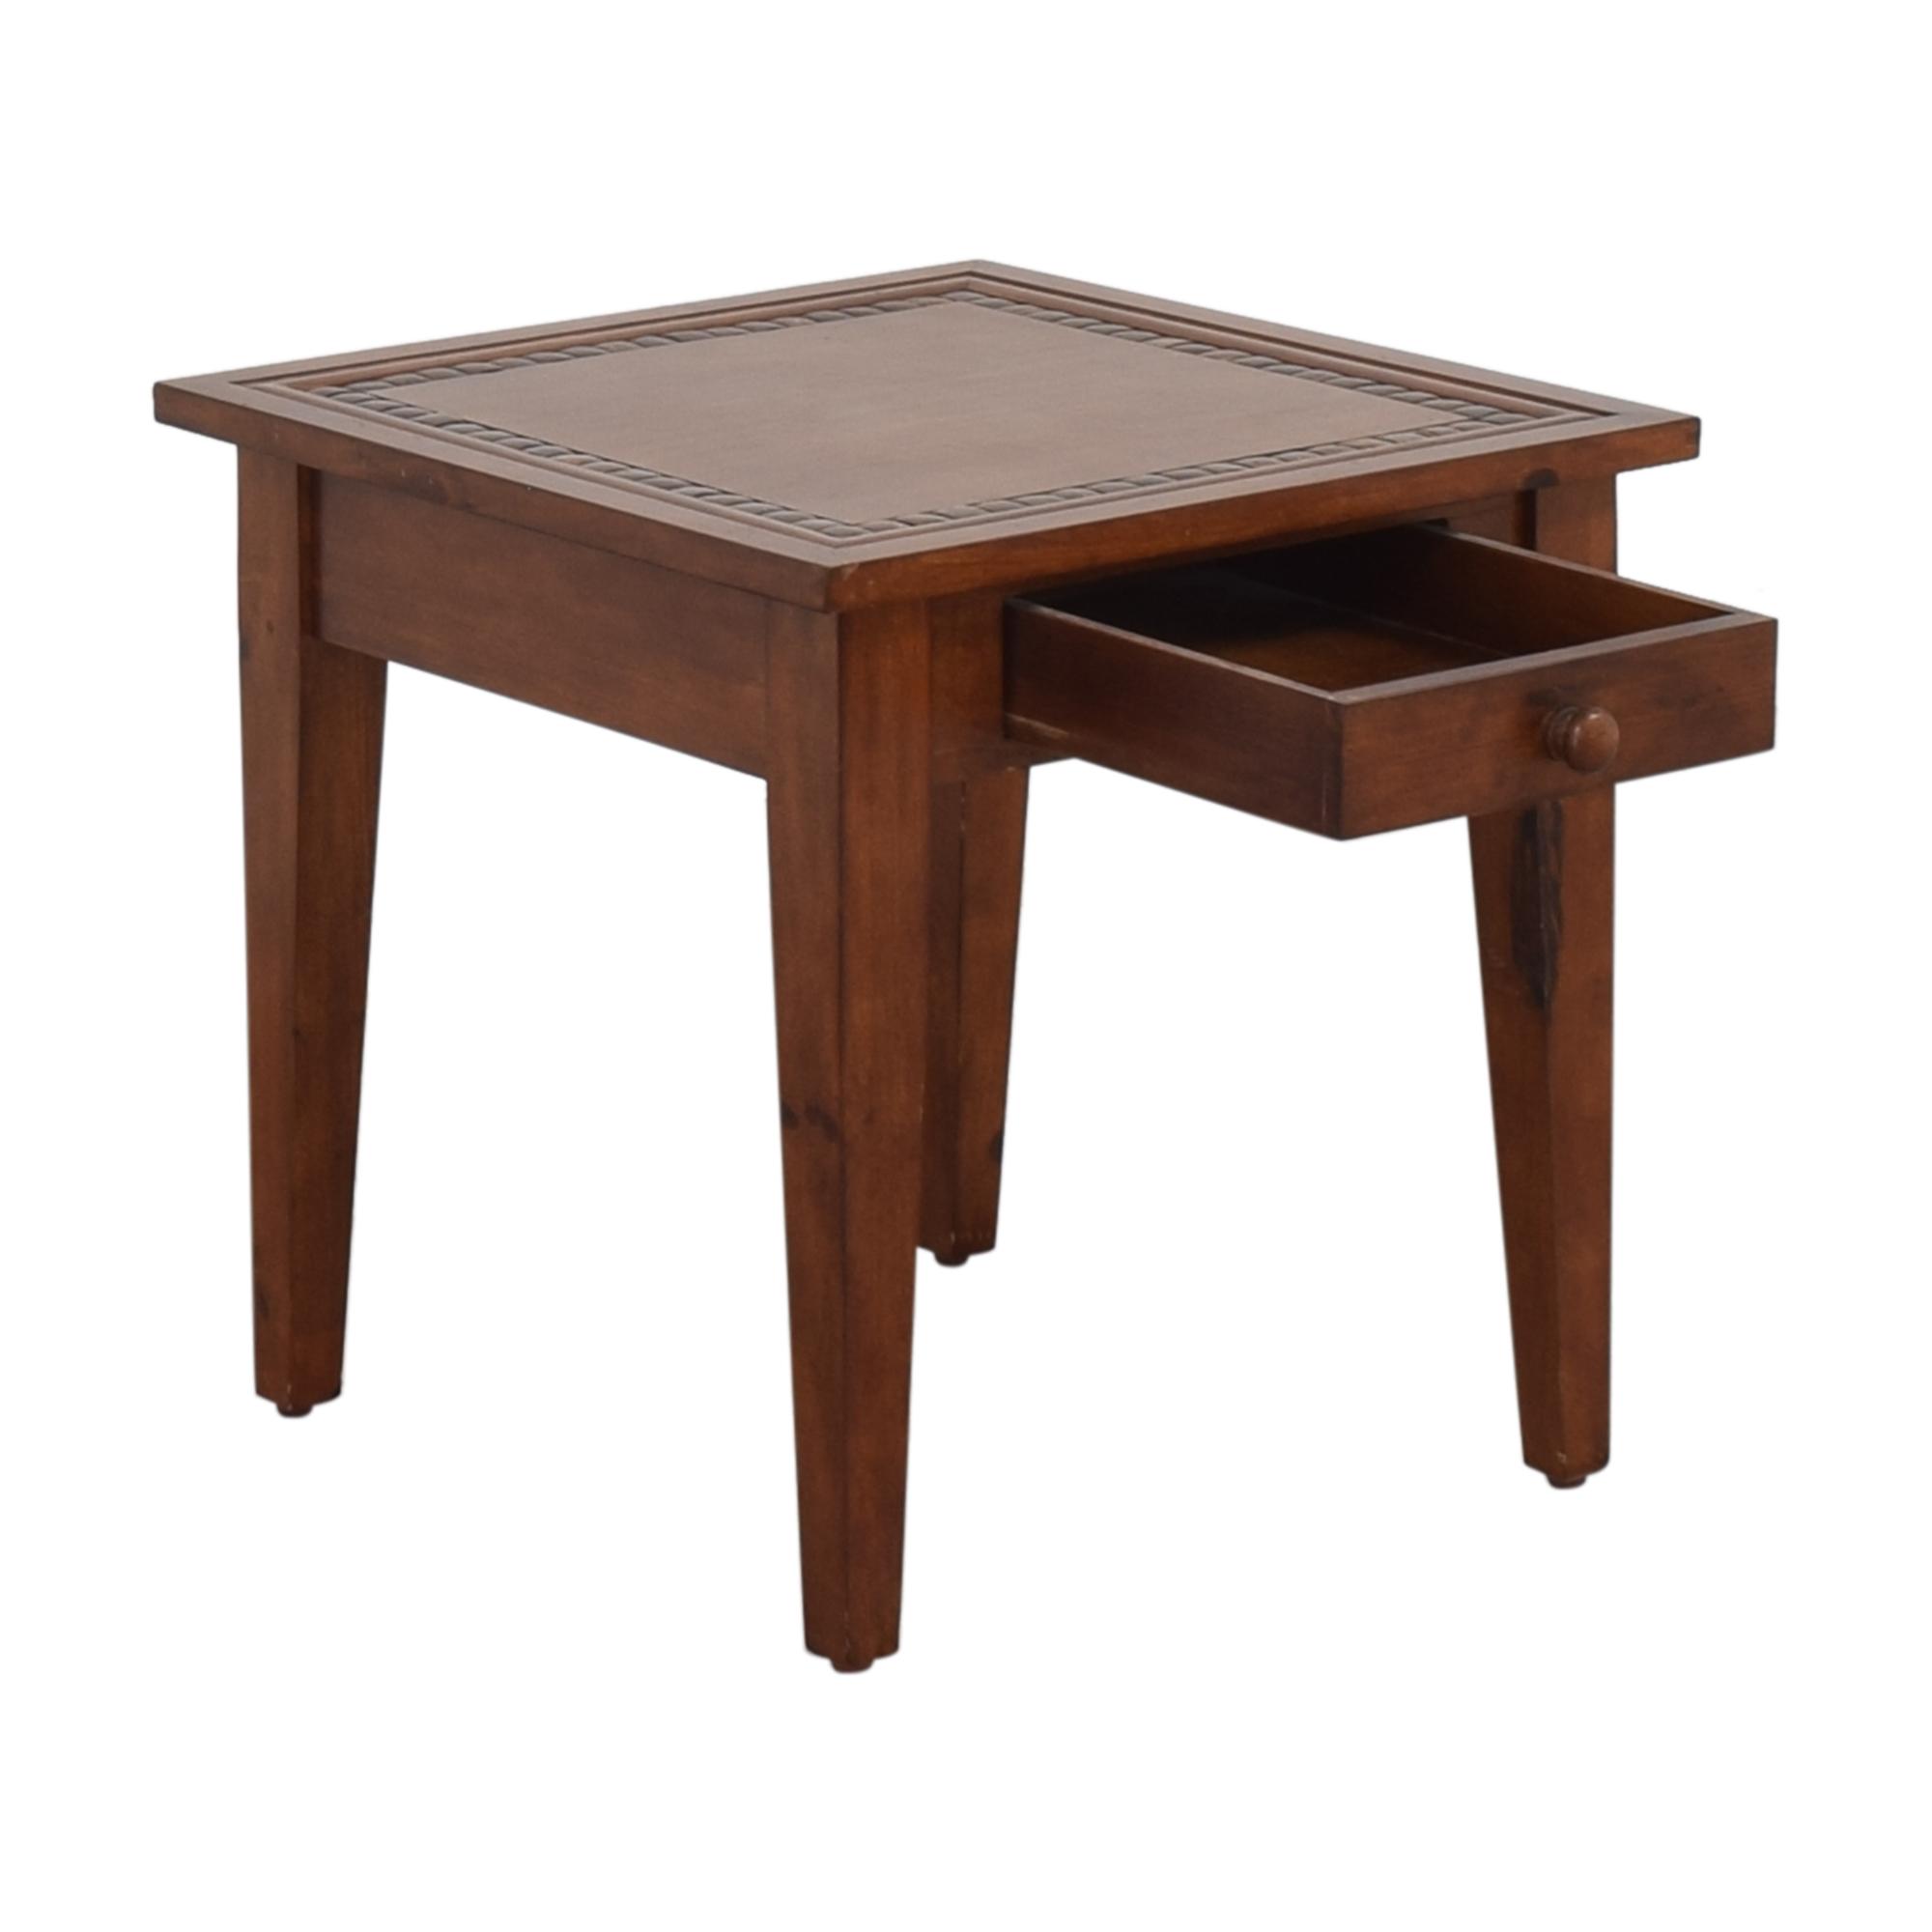 Ethan Allen Ethan Allen Single Drawer End Table on sale